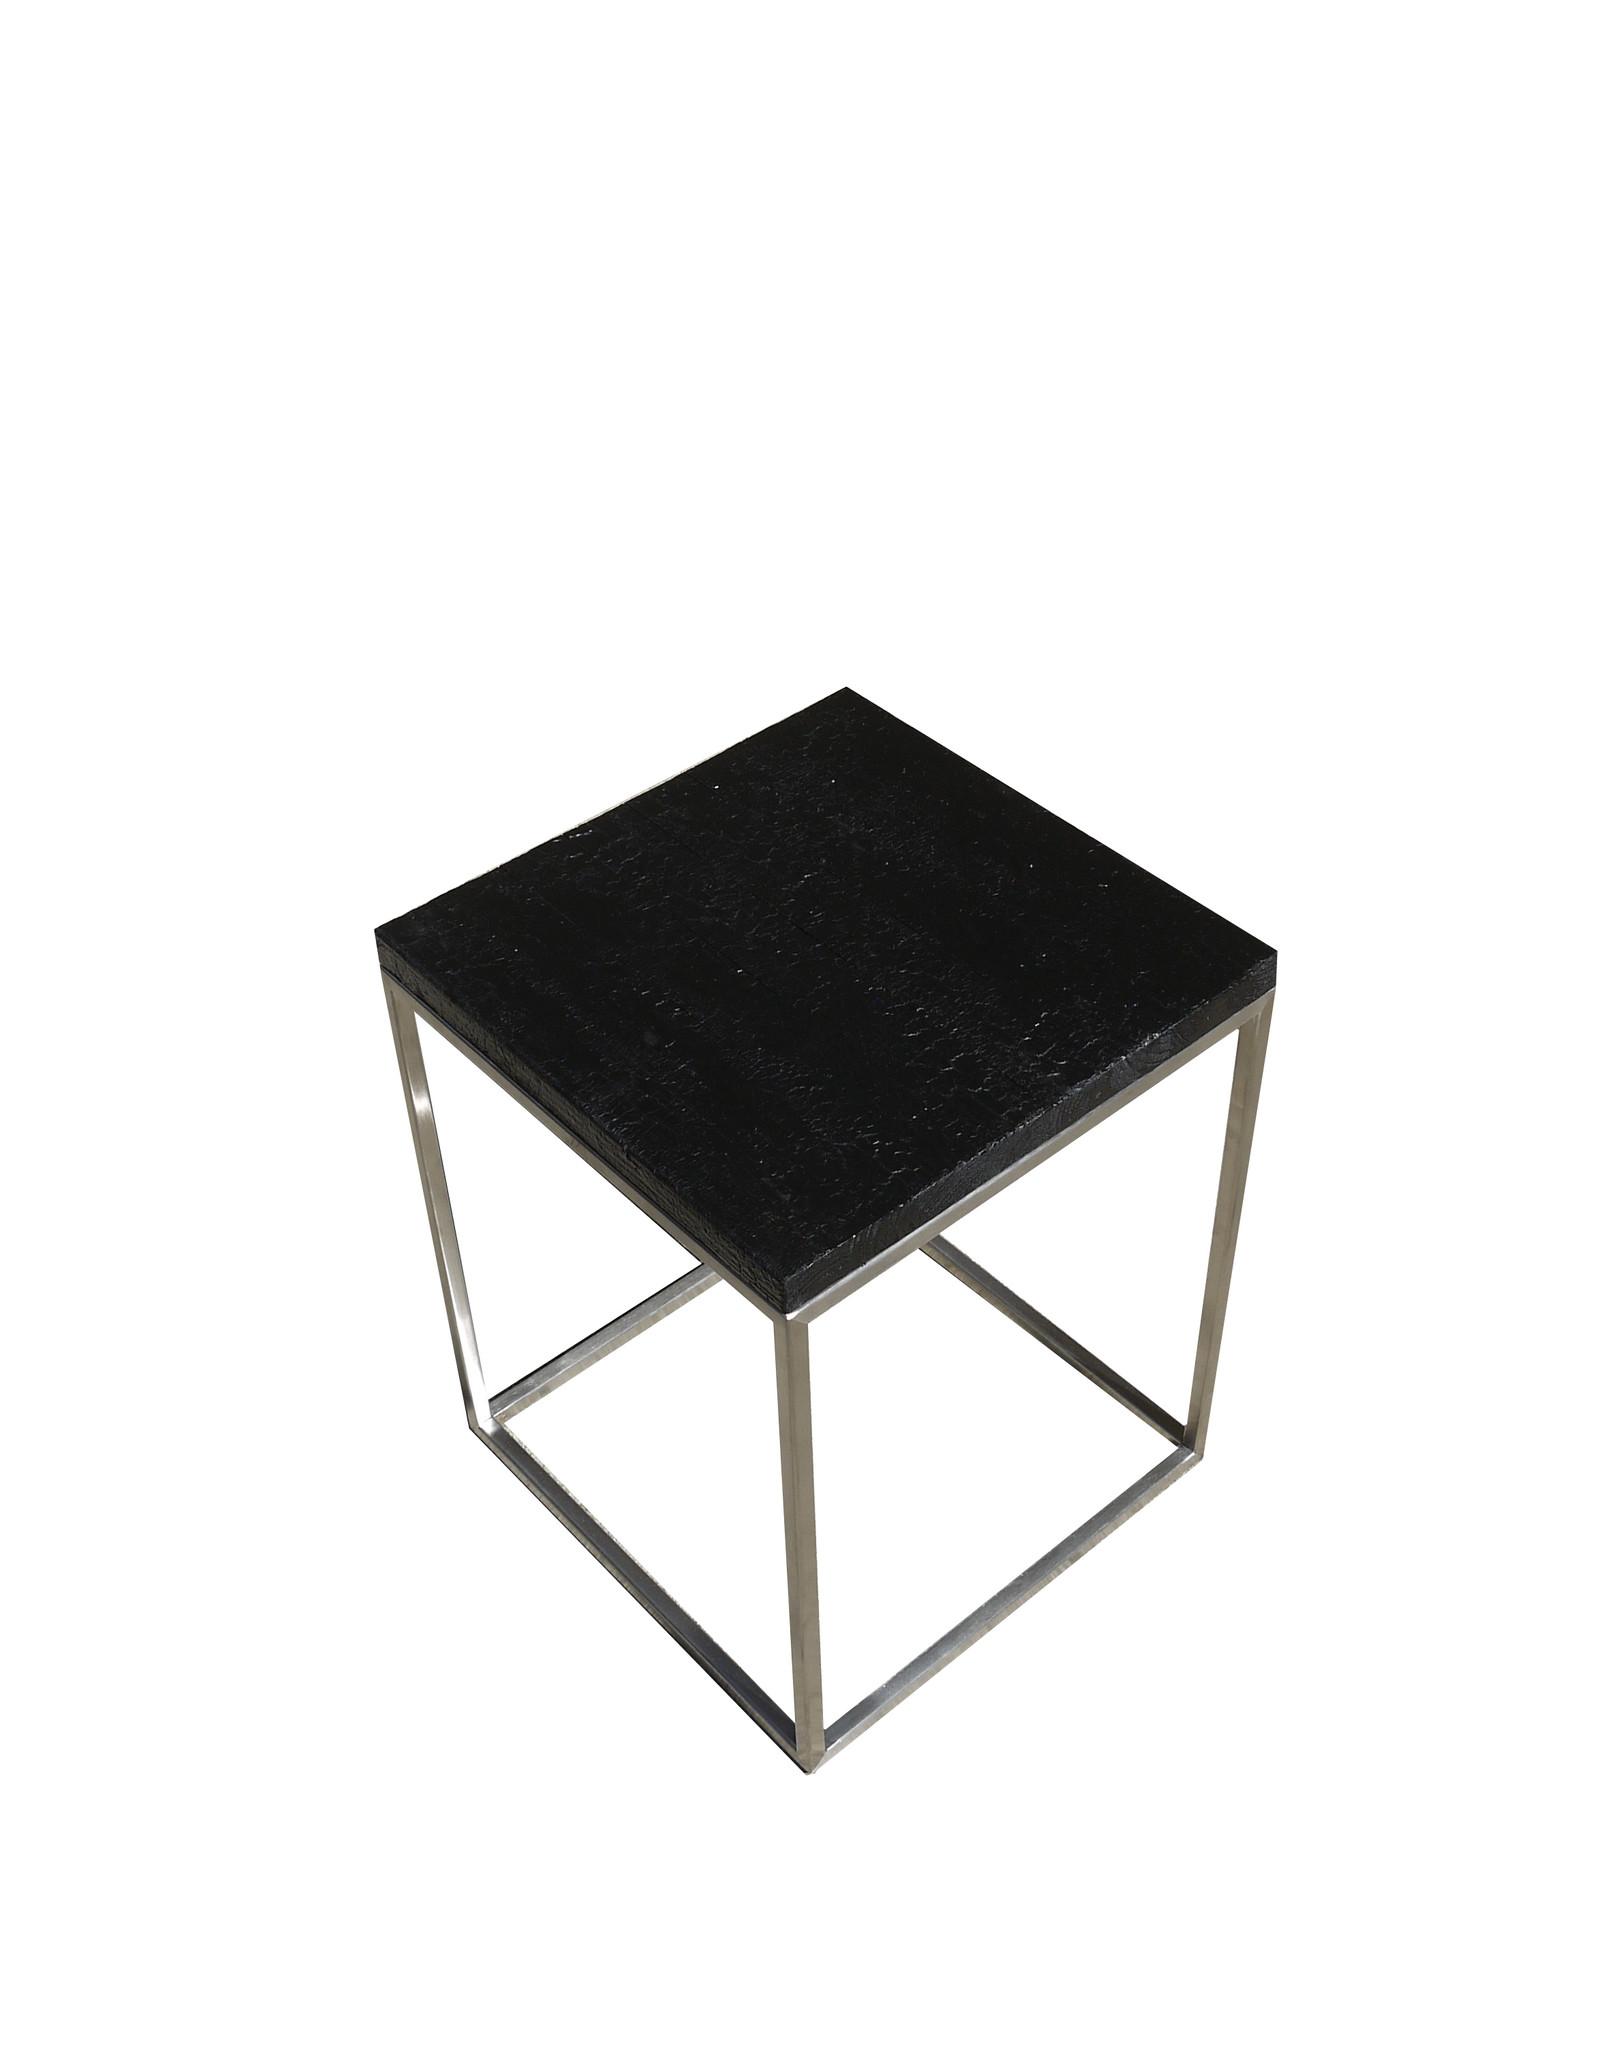 Flamed Wood Couchtisch Coffeetable Beistelltisch Cube  Kroko